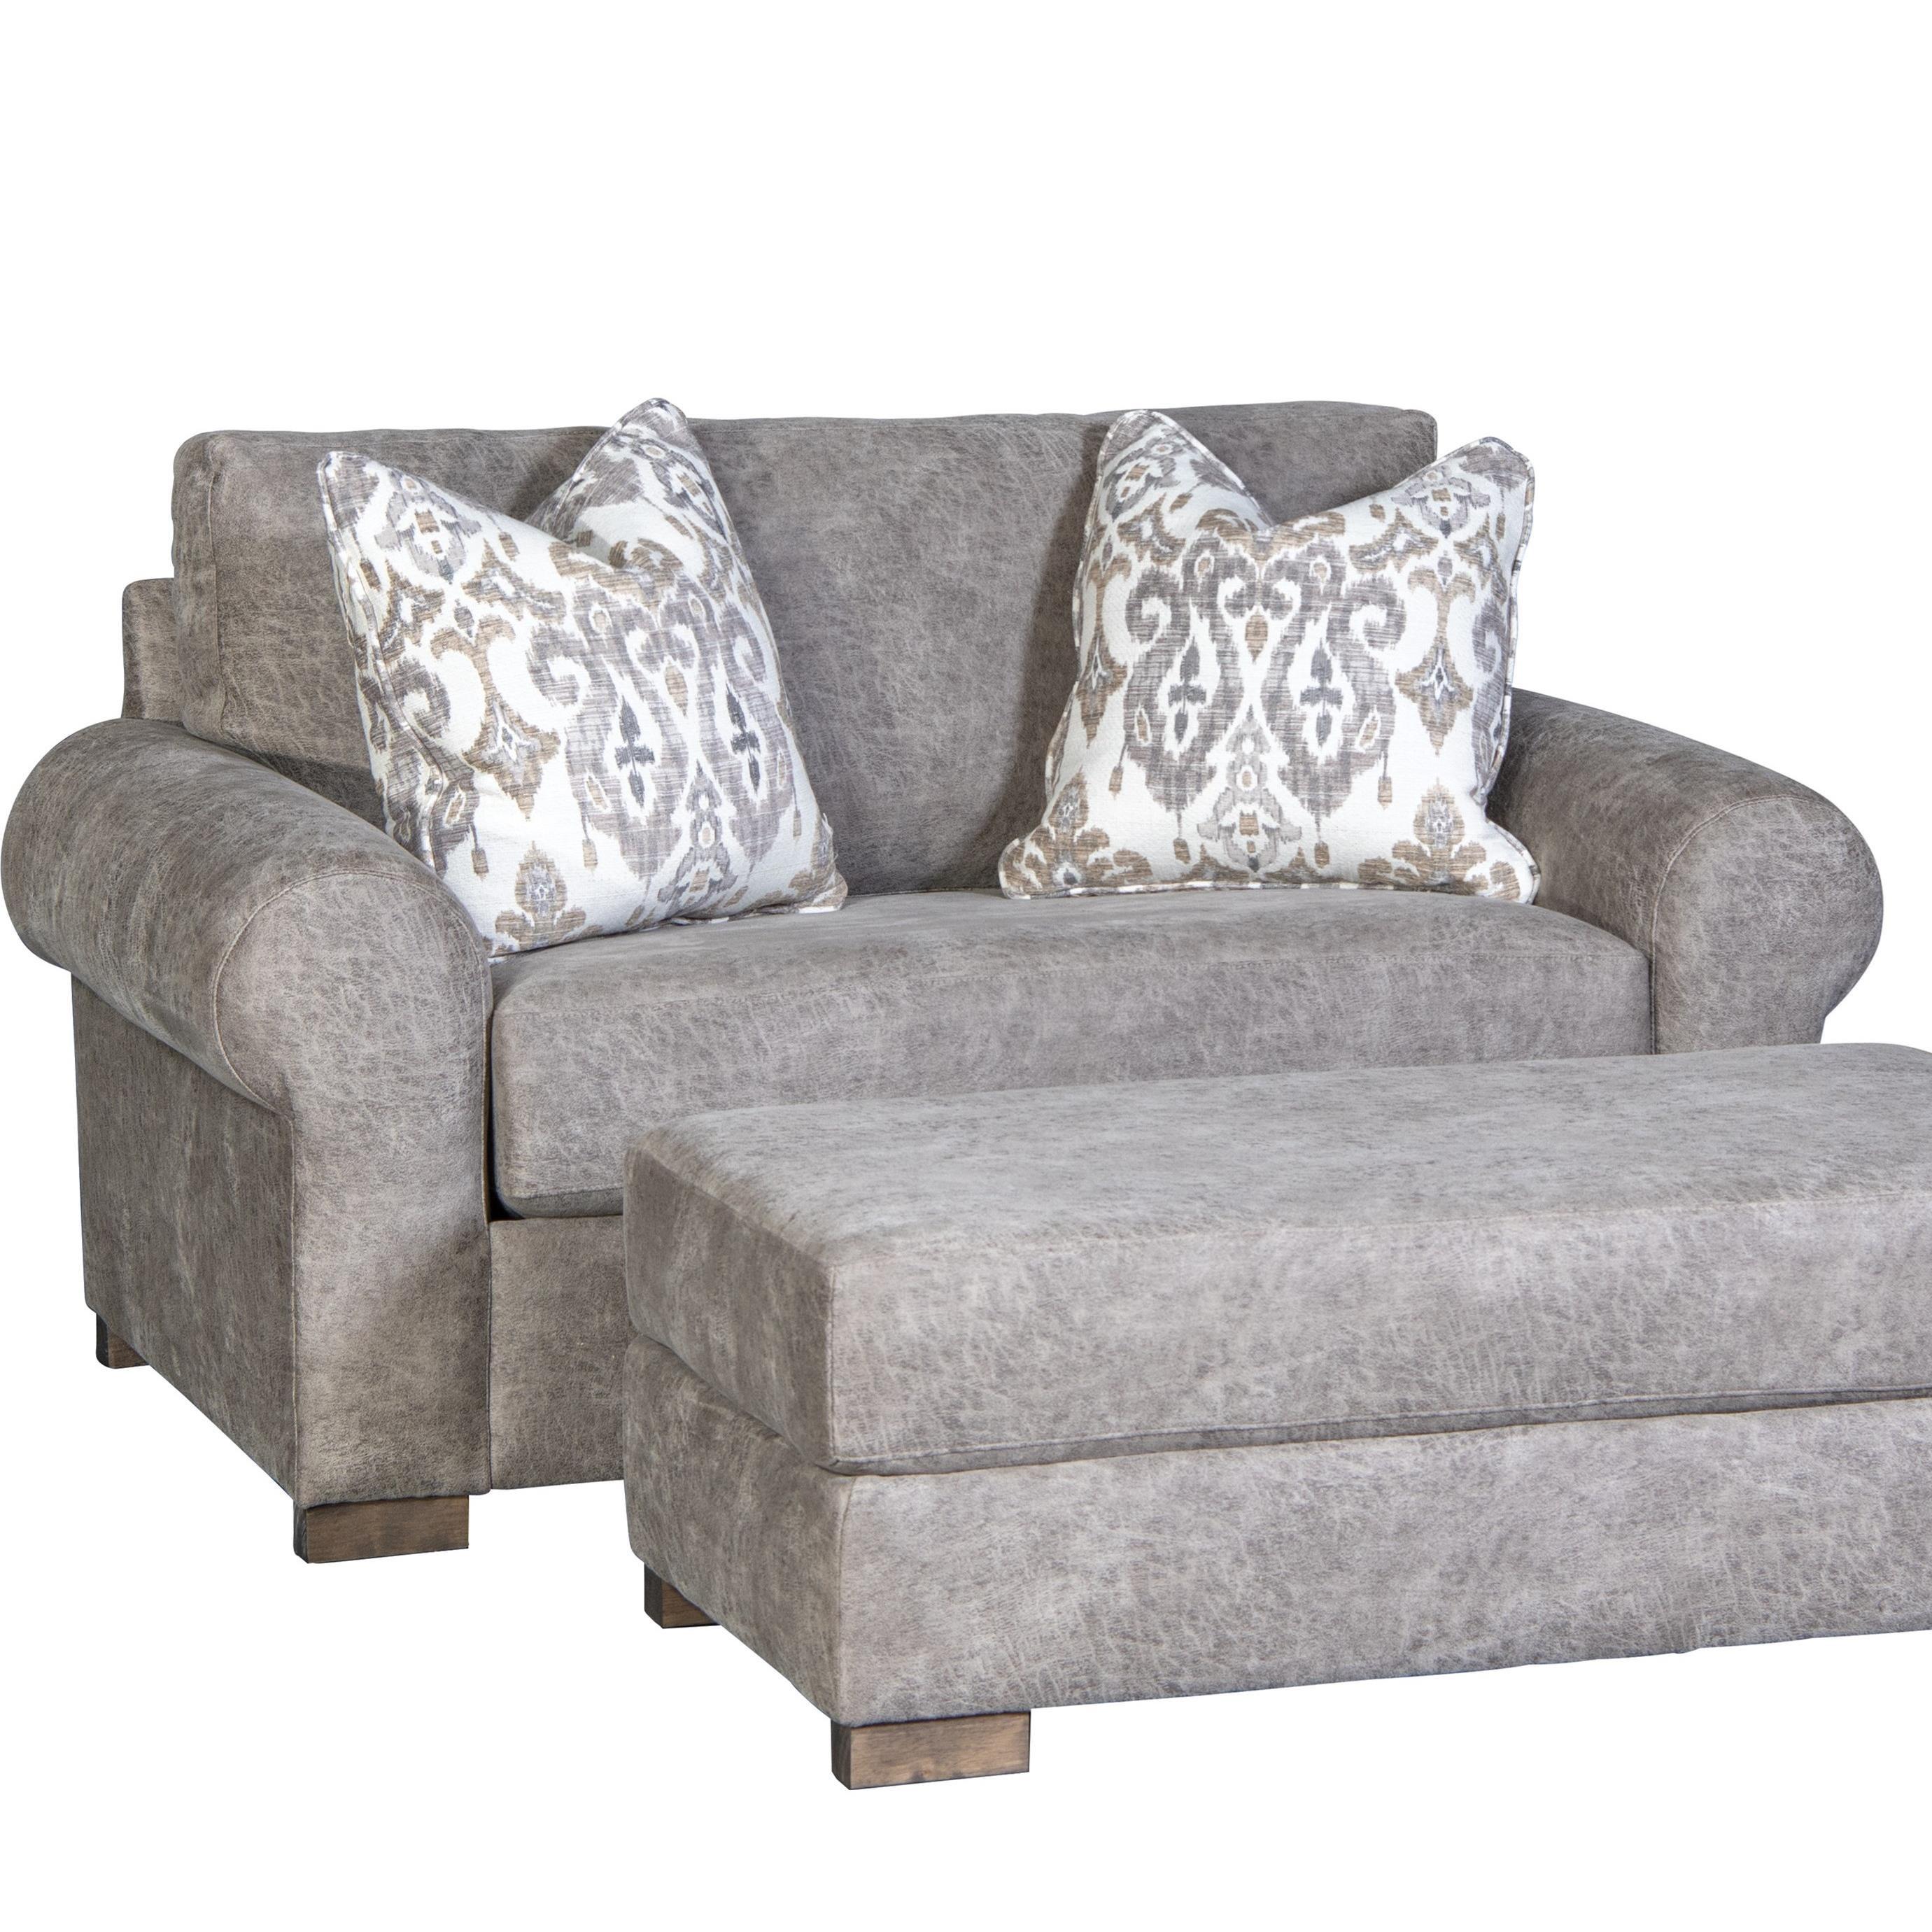 7202 Chair by Mayo at Pedigo Furniture